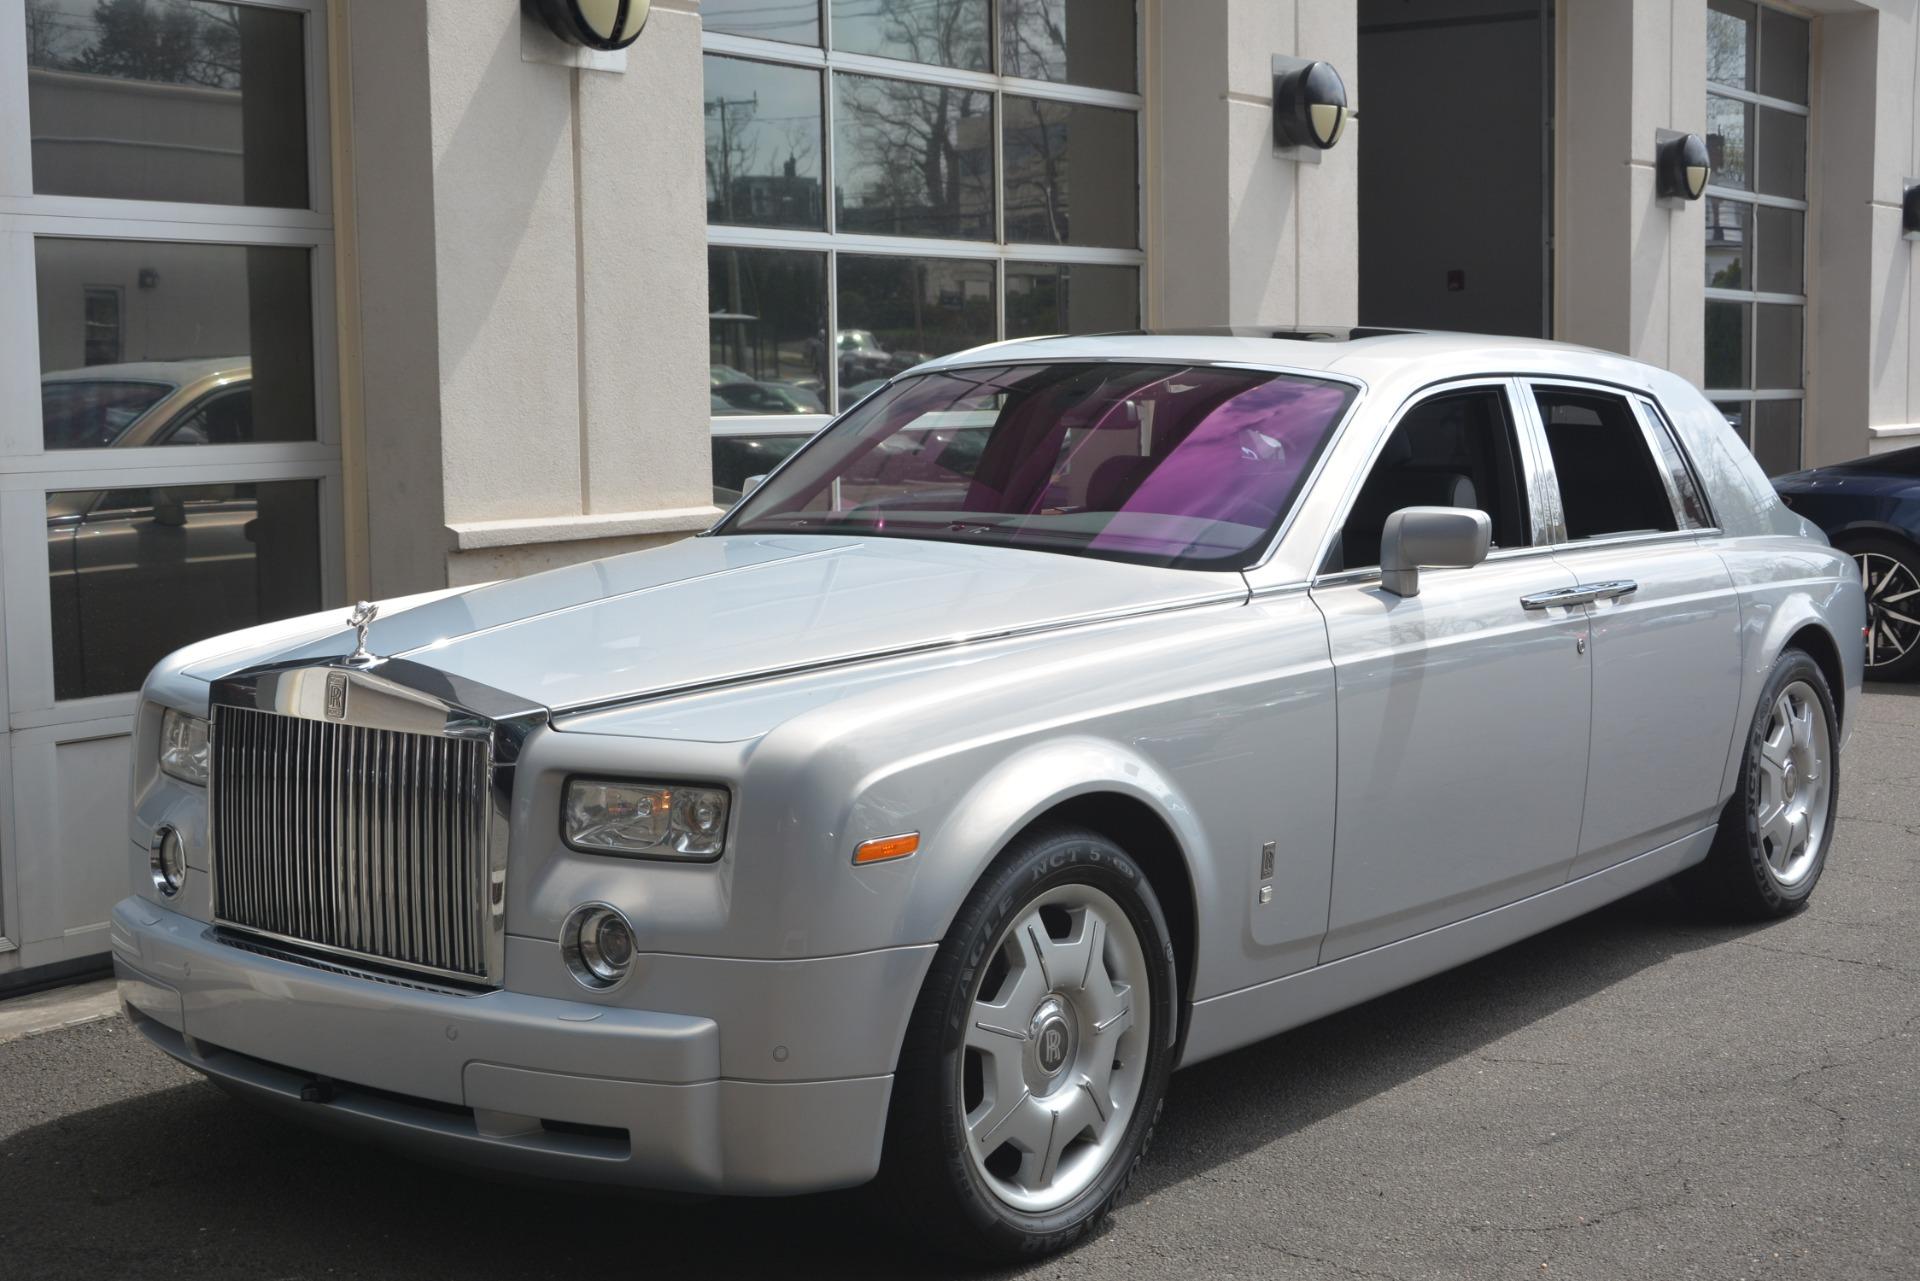 Used 2007 Rolls-Royce Phantom  For Sale In Greenwich, CT 3089_p9